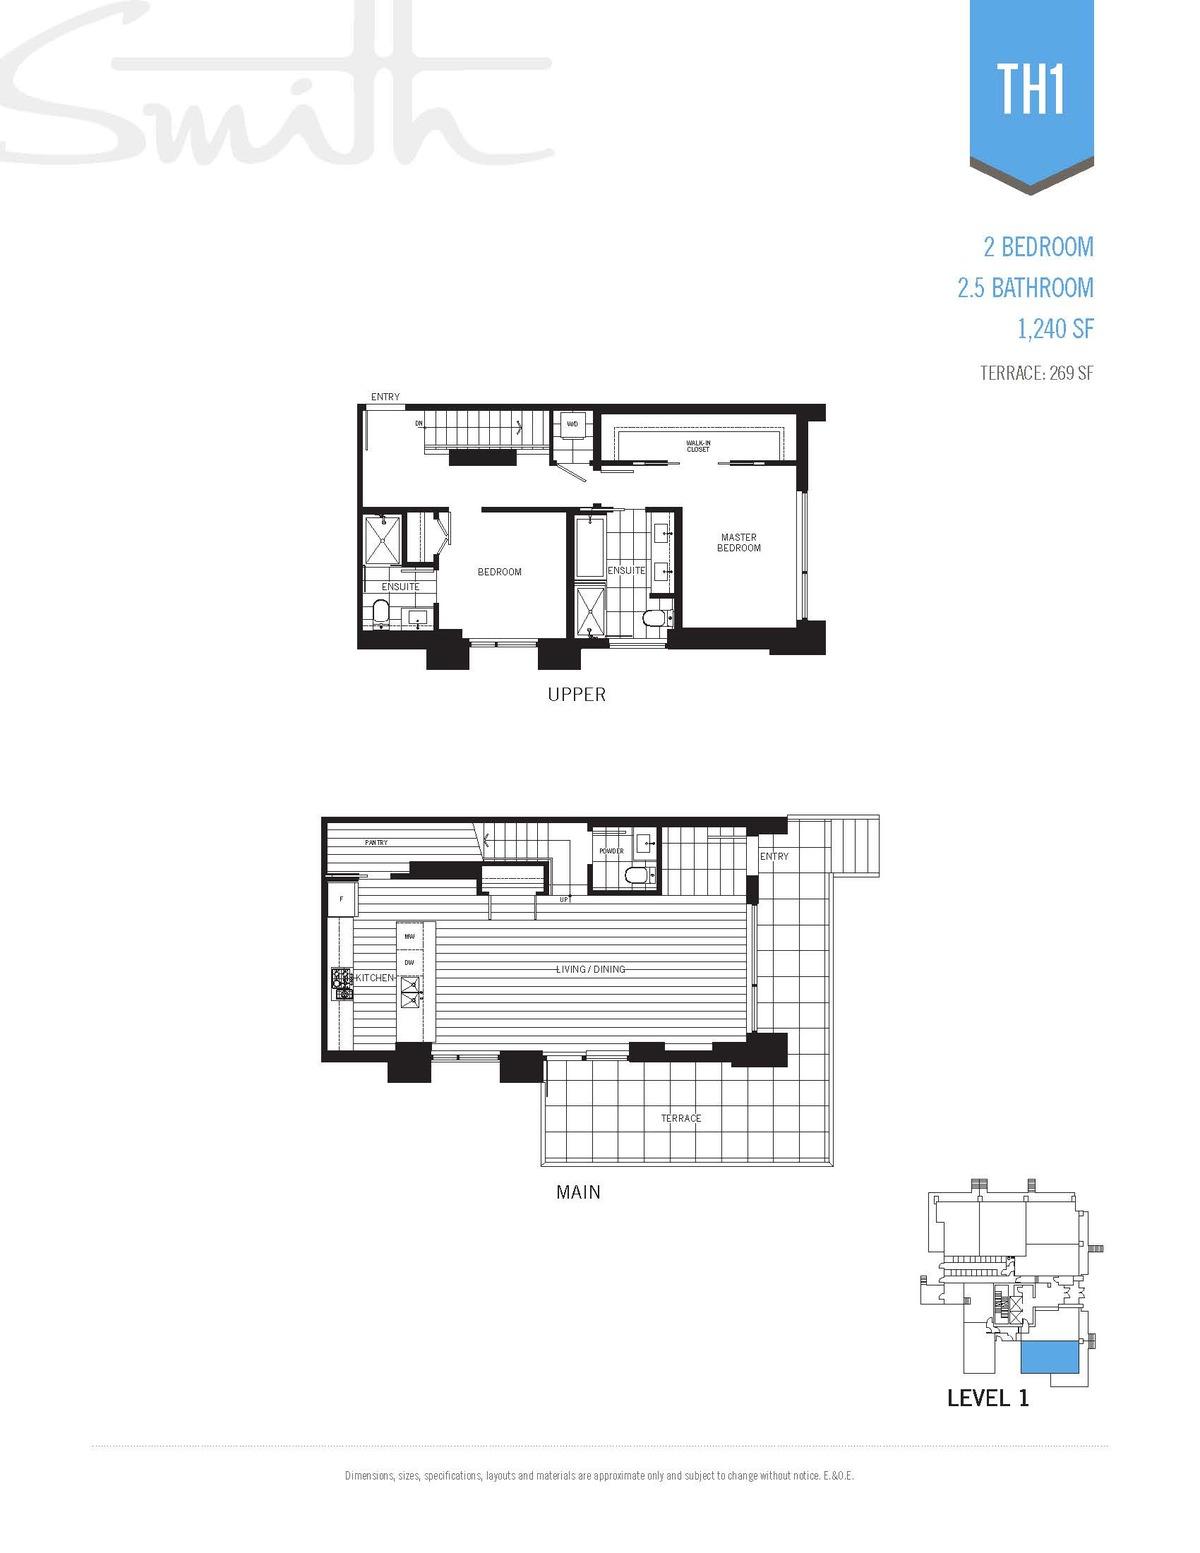 Smith Floorplan TH1